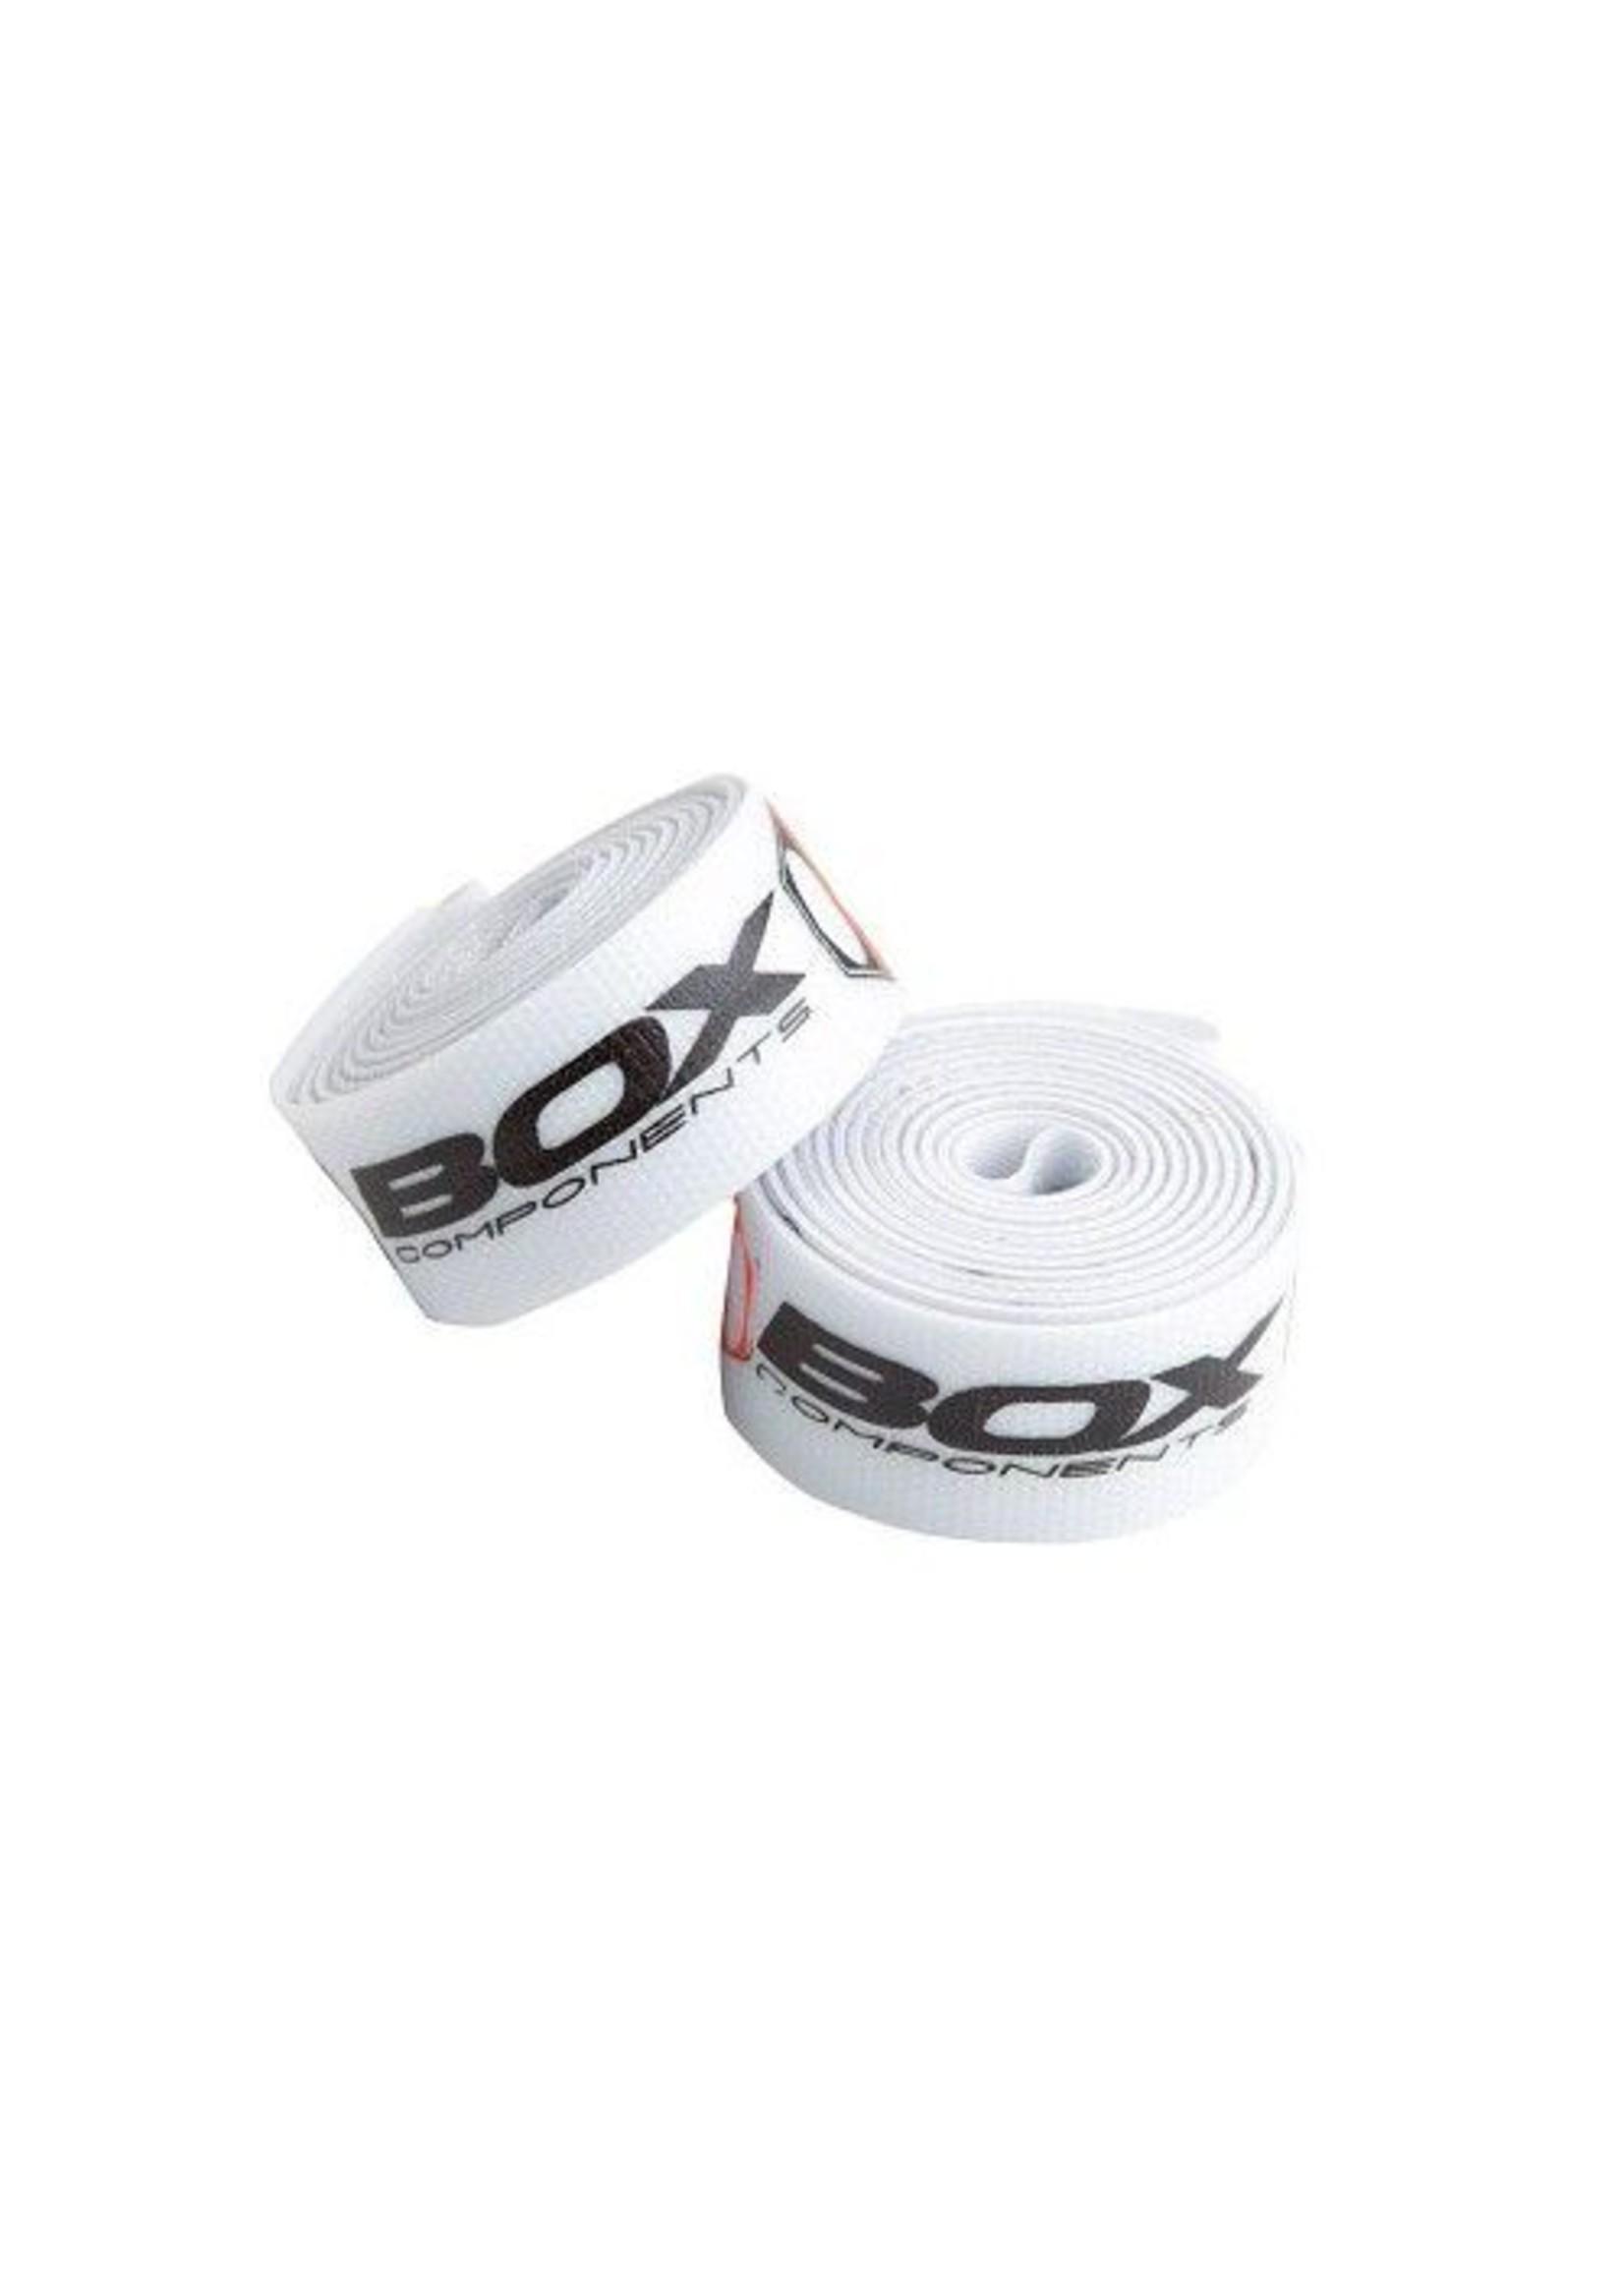 Box Components Box Rim Strap Pair